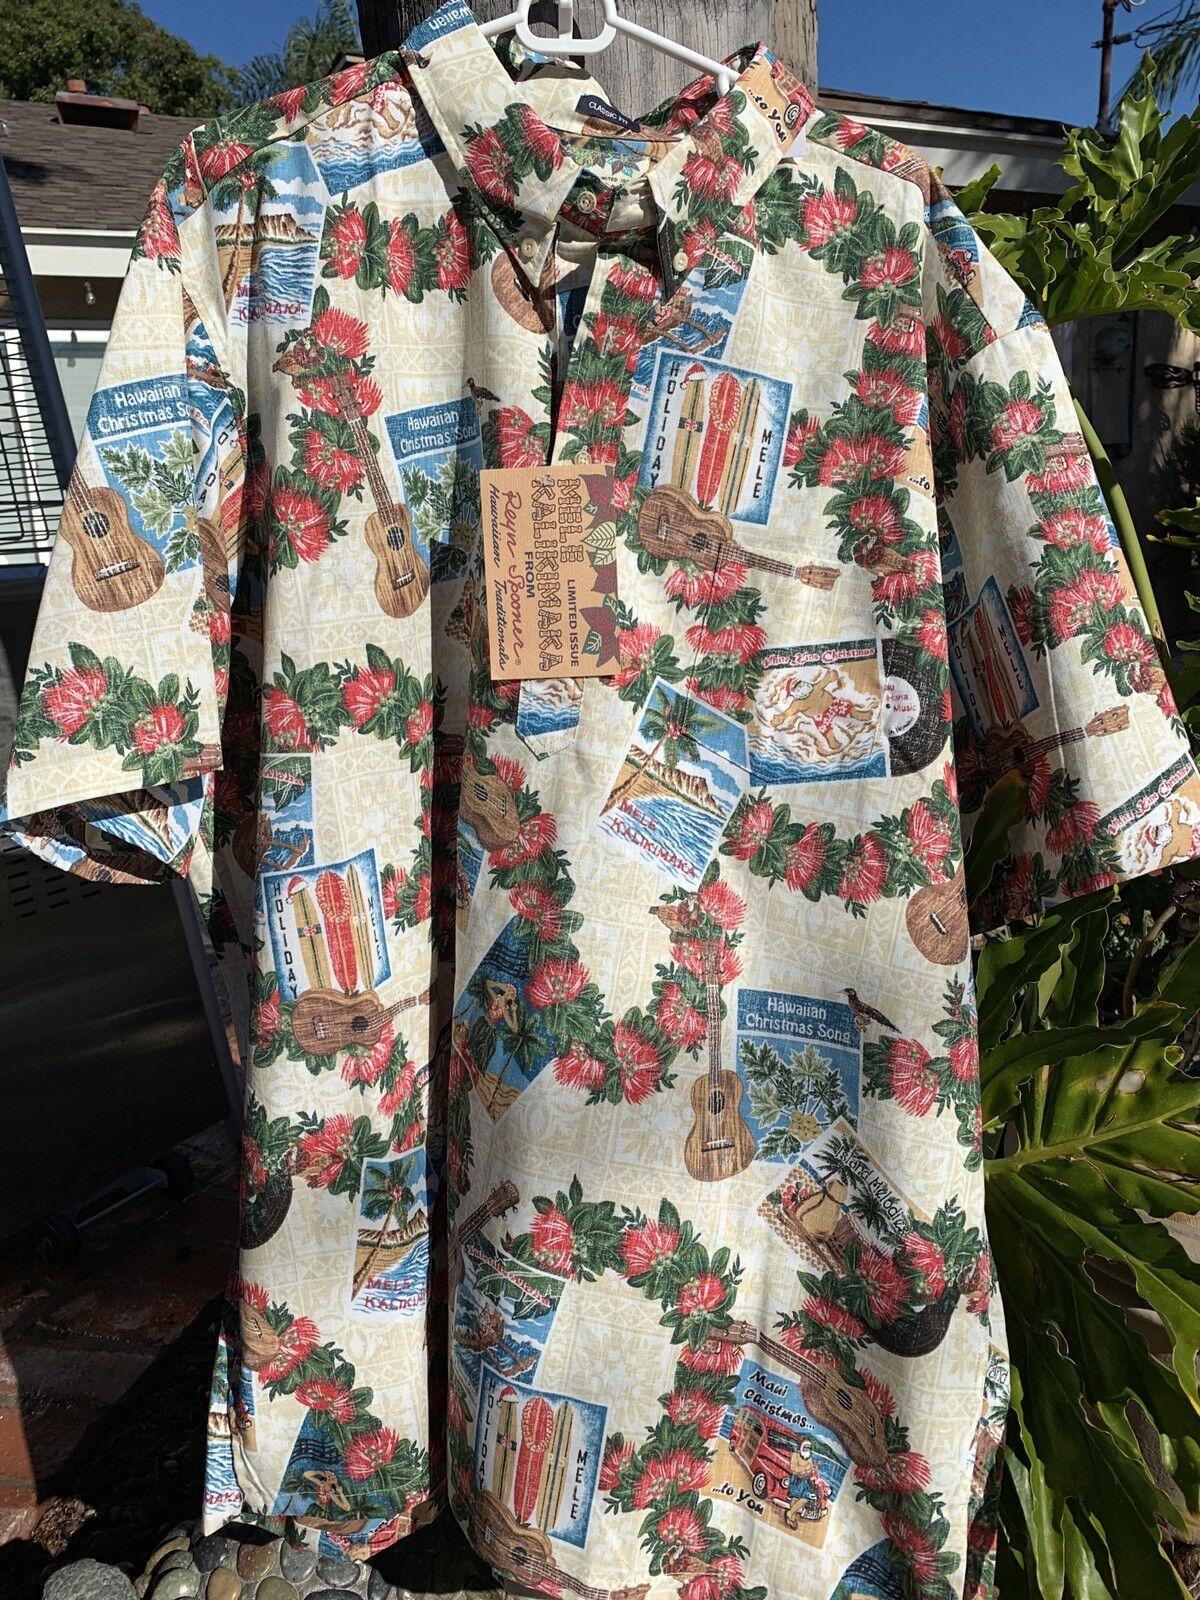 NWT Reyn Spooner 2017 Mele Kalikimaka Christmas Shirt 3XL Santa Holiday Cream